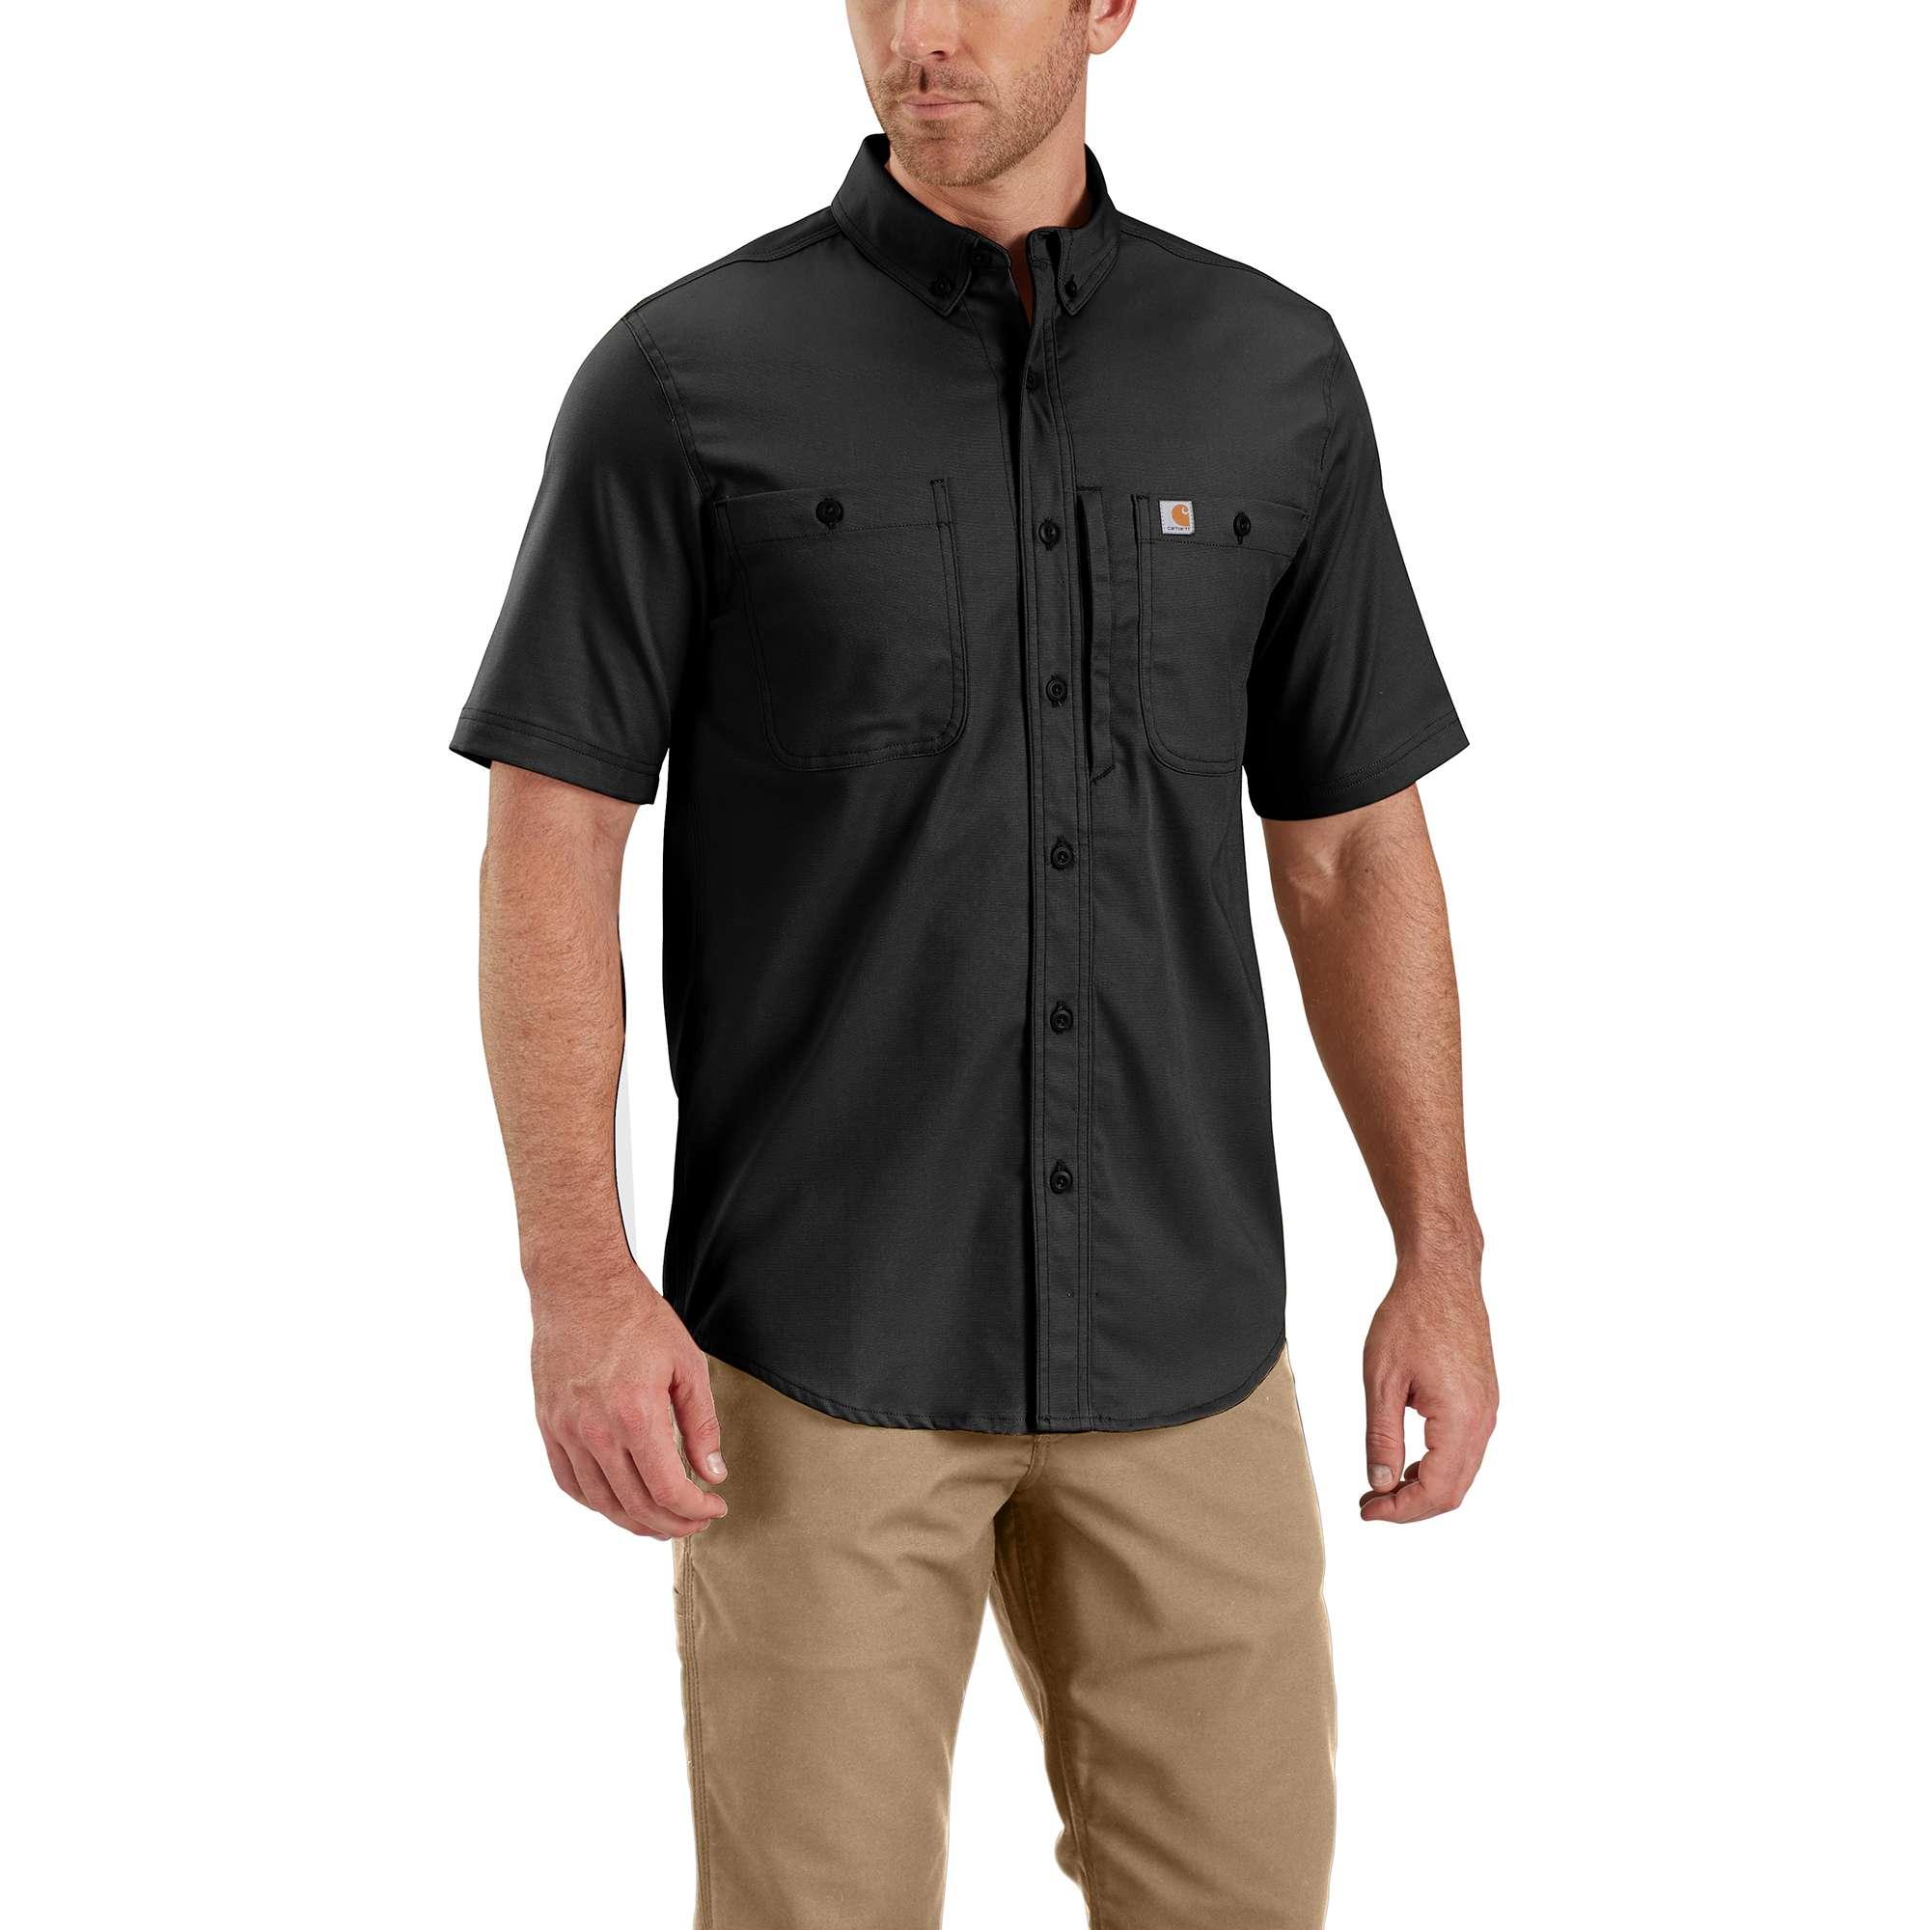 Rugged Professional™ Series Short-Sleeve Shirt - Men